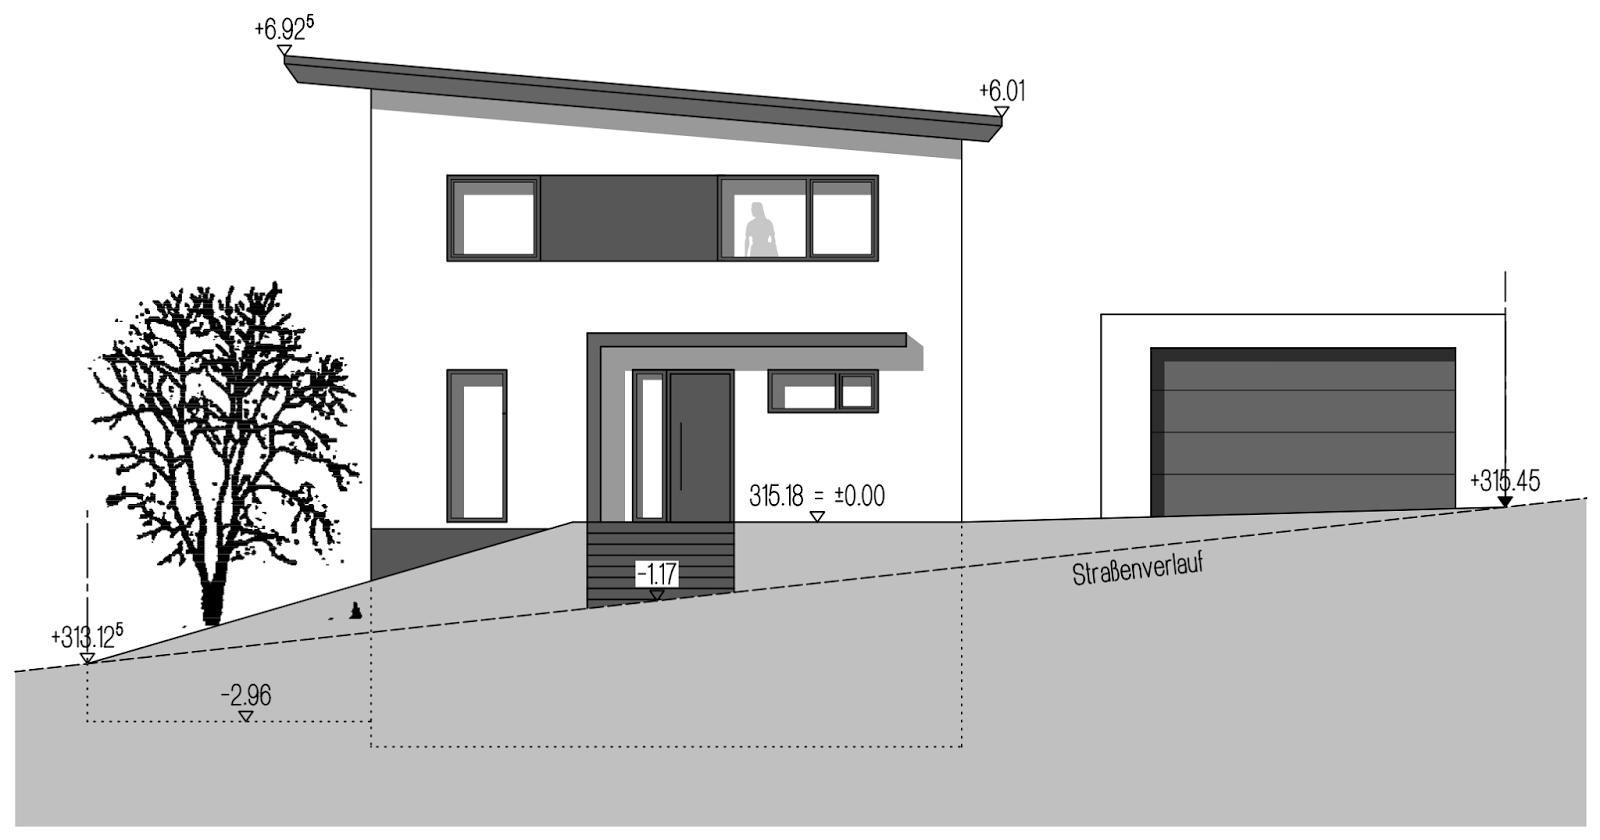 Fertiggarage beton roh  Fertiggarage ja, aber welche? Betongarage vs. Stahlgarage | Bauen ...